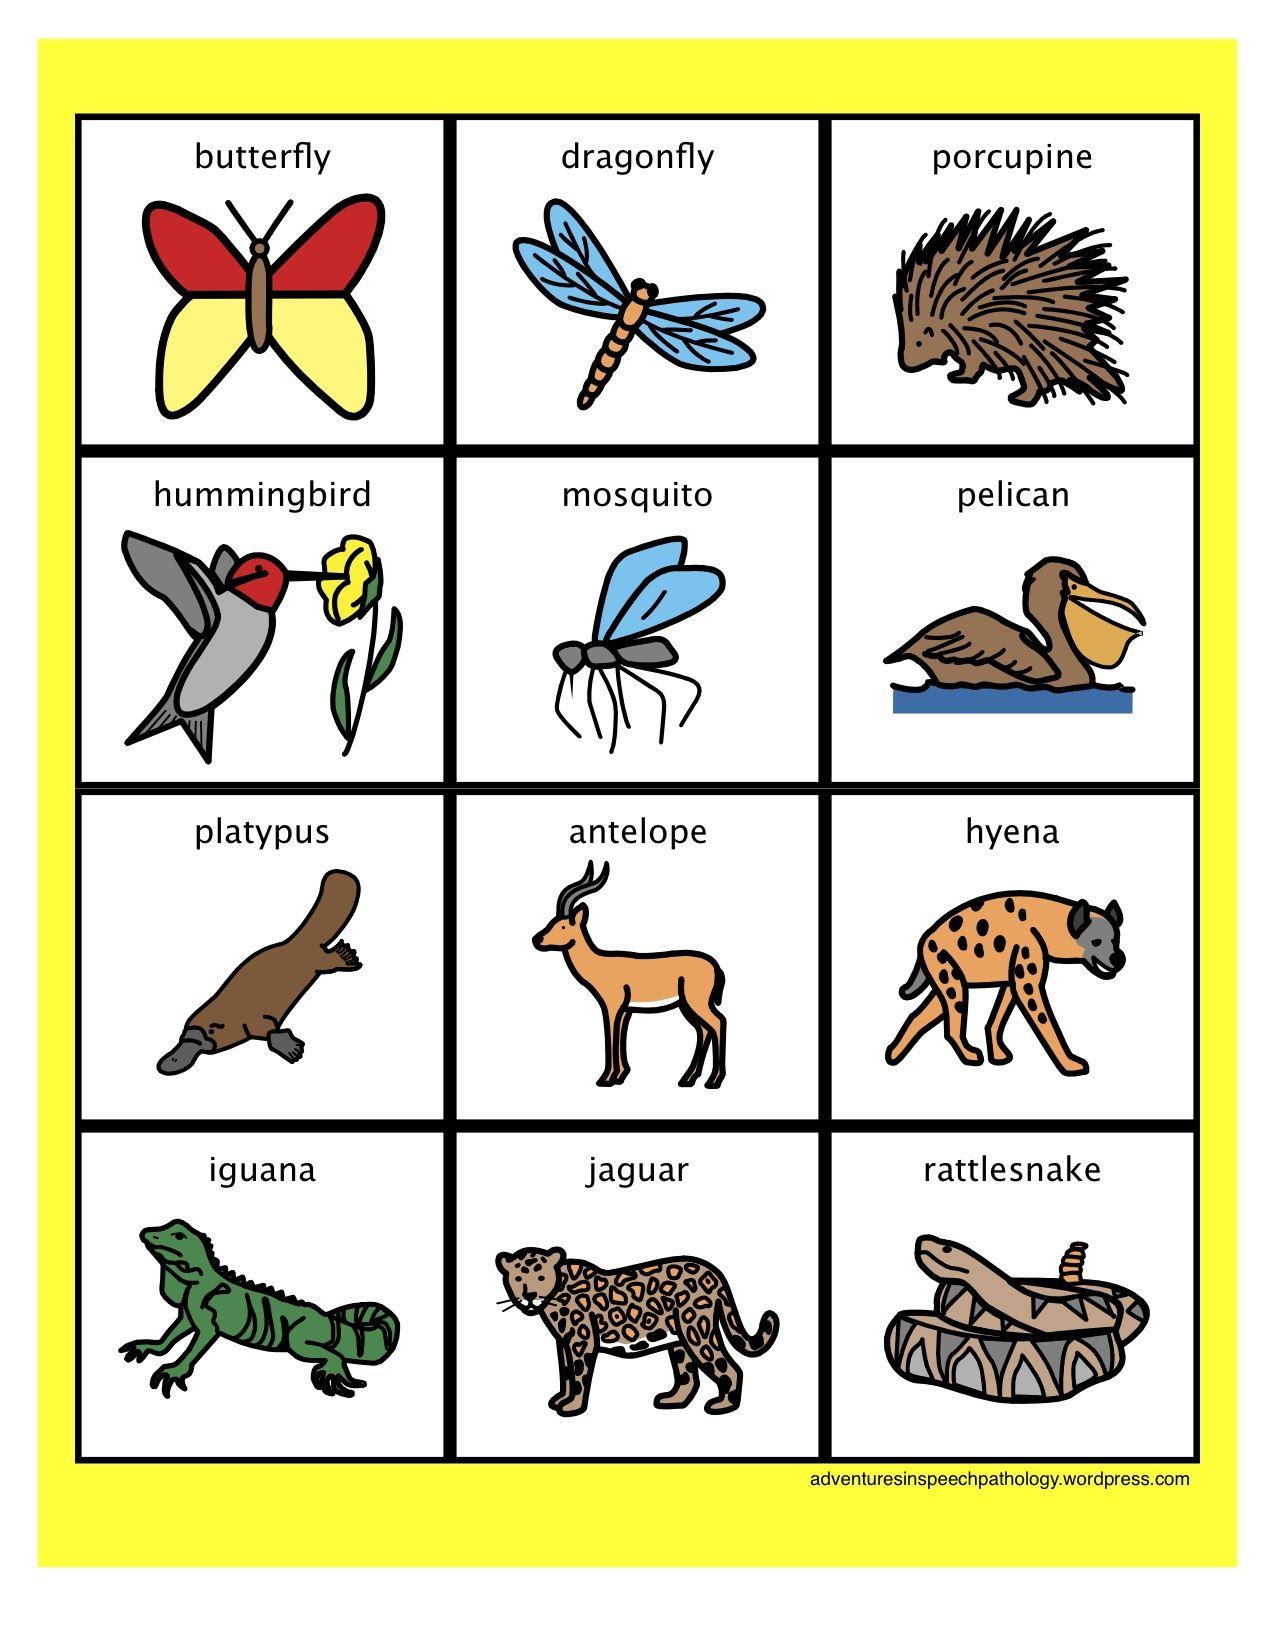 Multisyllablic Words To Practice Phonological Awareness